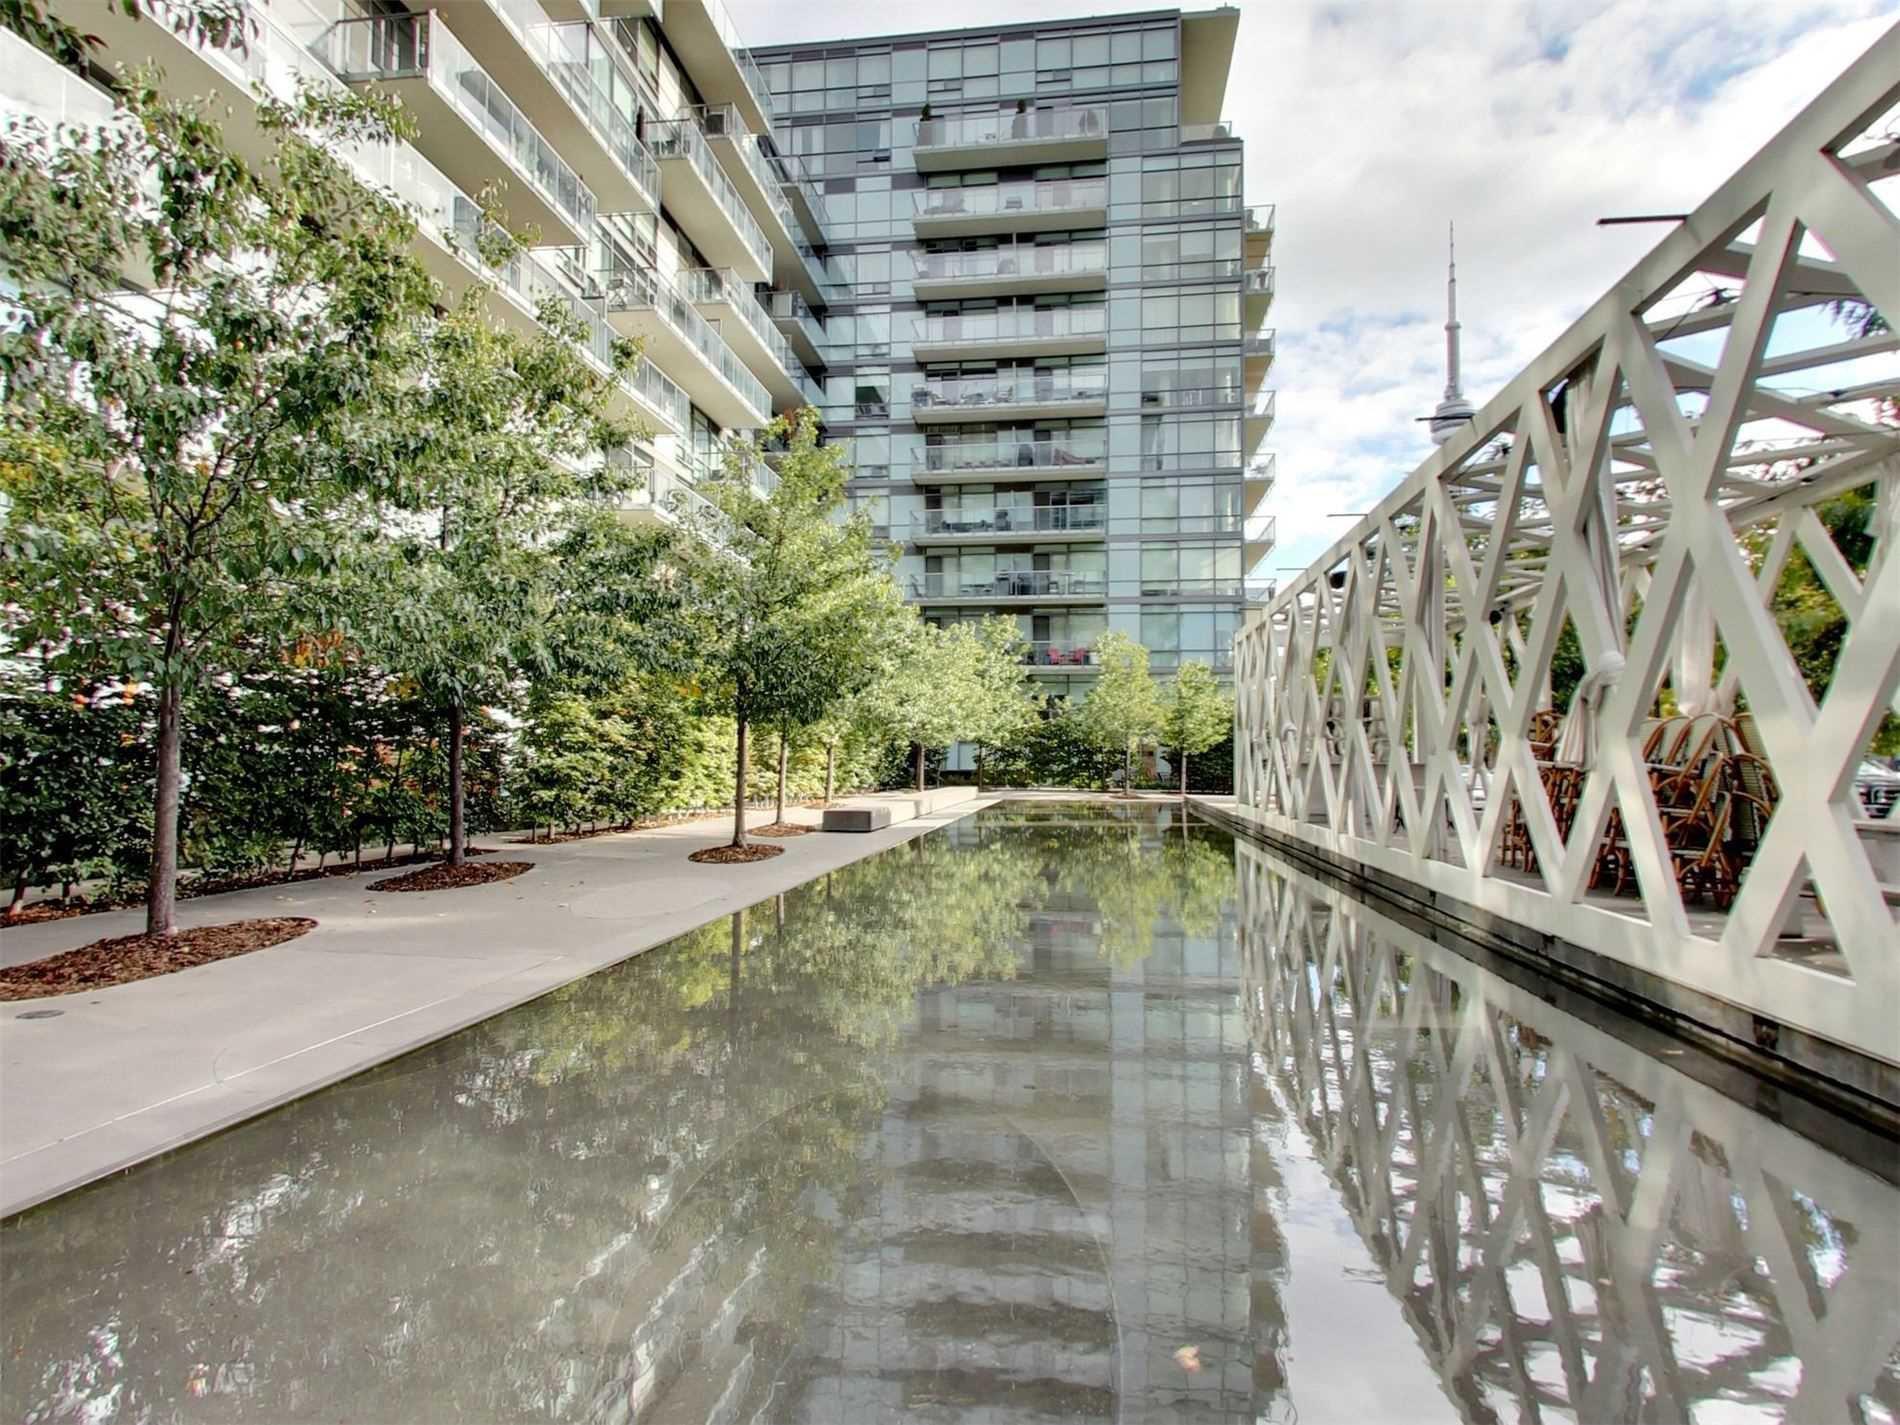 Photo 20: Photos: 818 55 Stewart Street in Toronto: Waterfront Communities C1 Condo for sale (Toronto C01)  : MLS®# C4690098